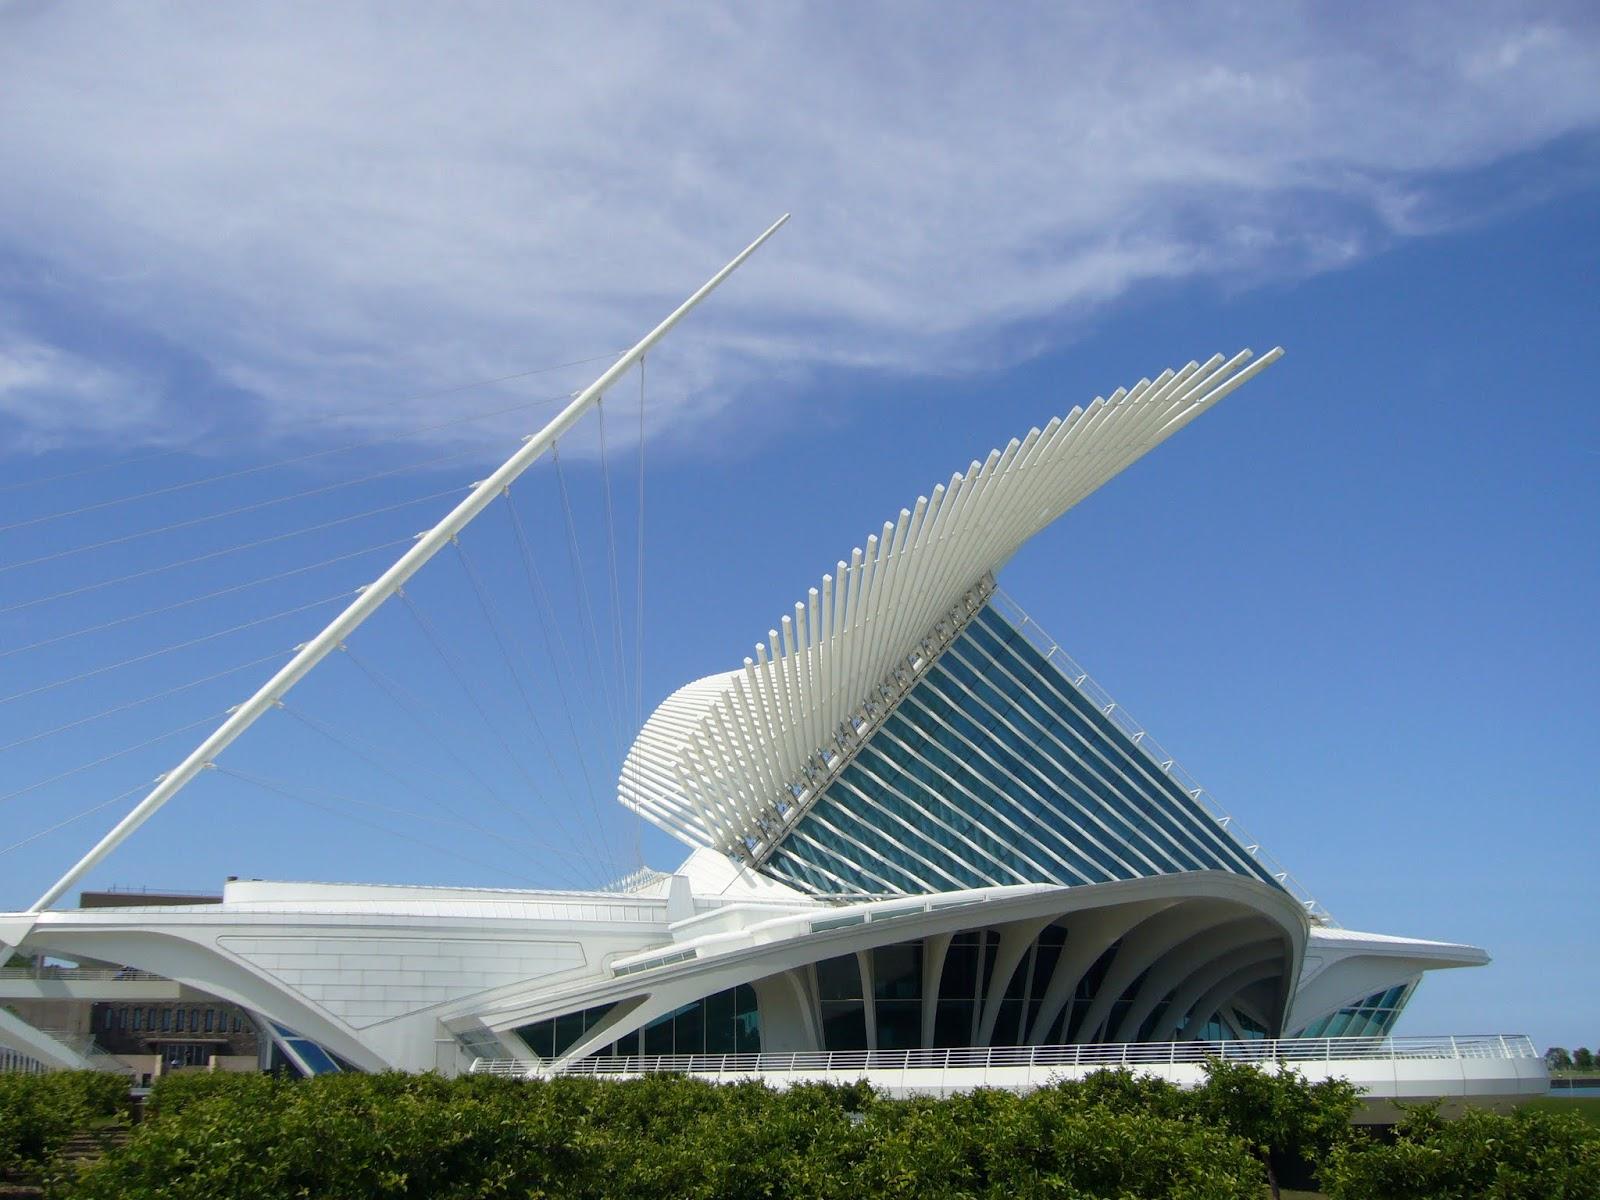 gaudi calatrava urban architecture now